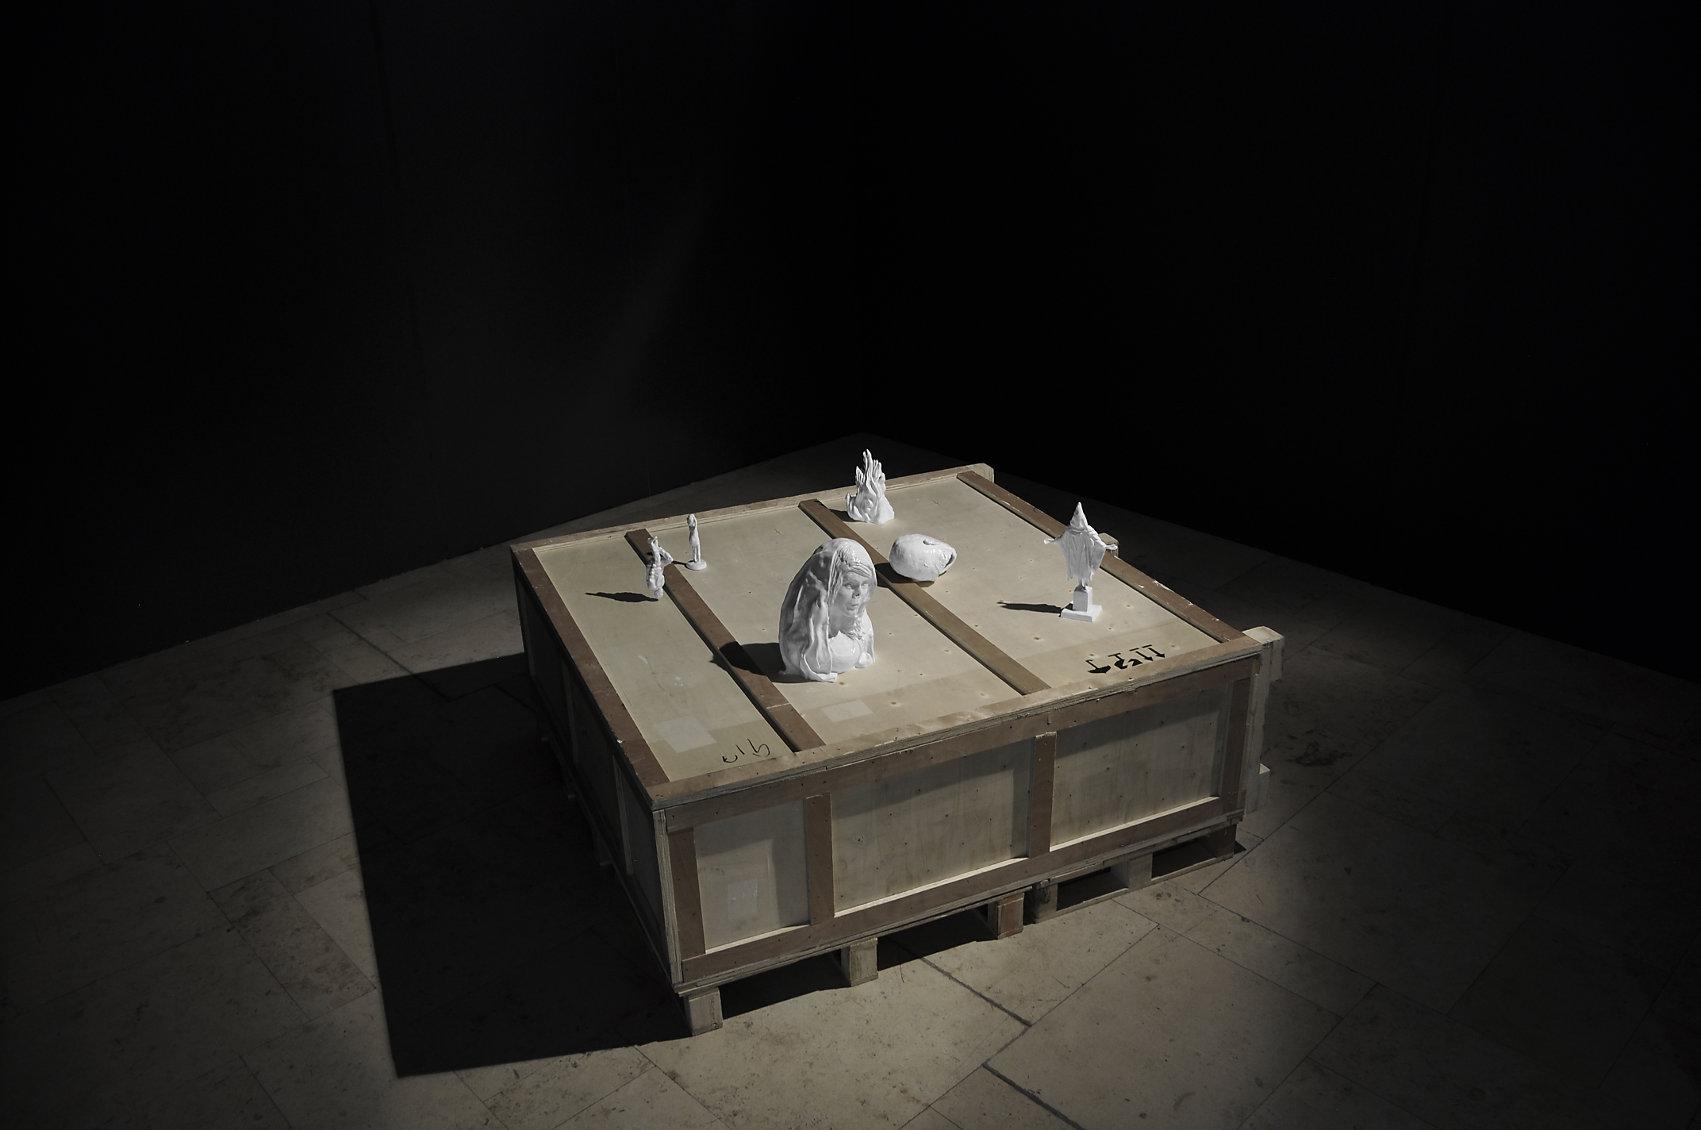 shining recollection, Ausstellungsansicht